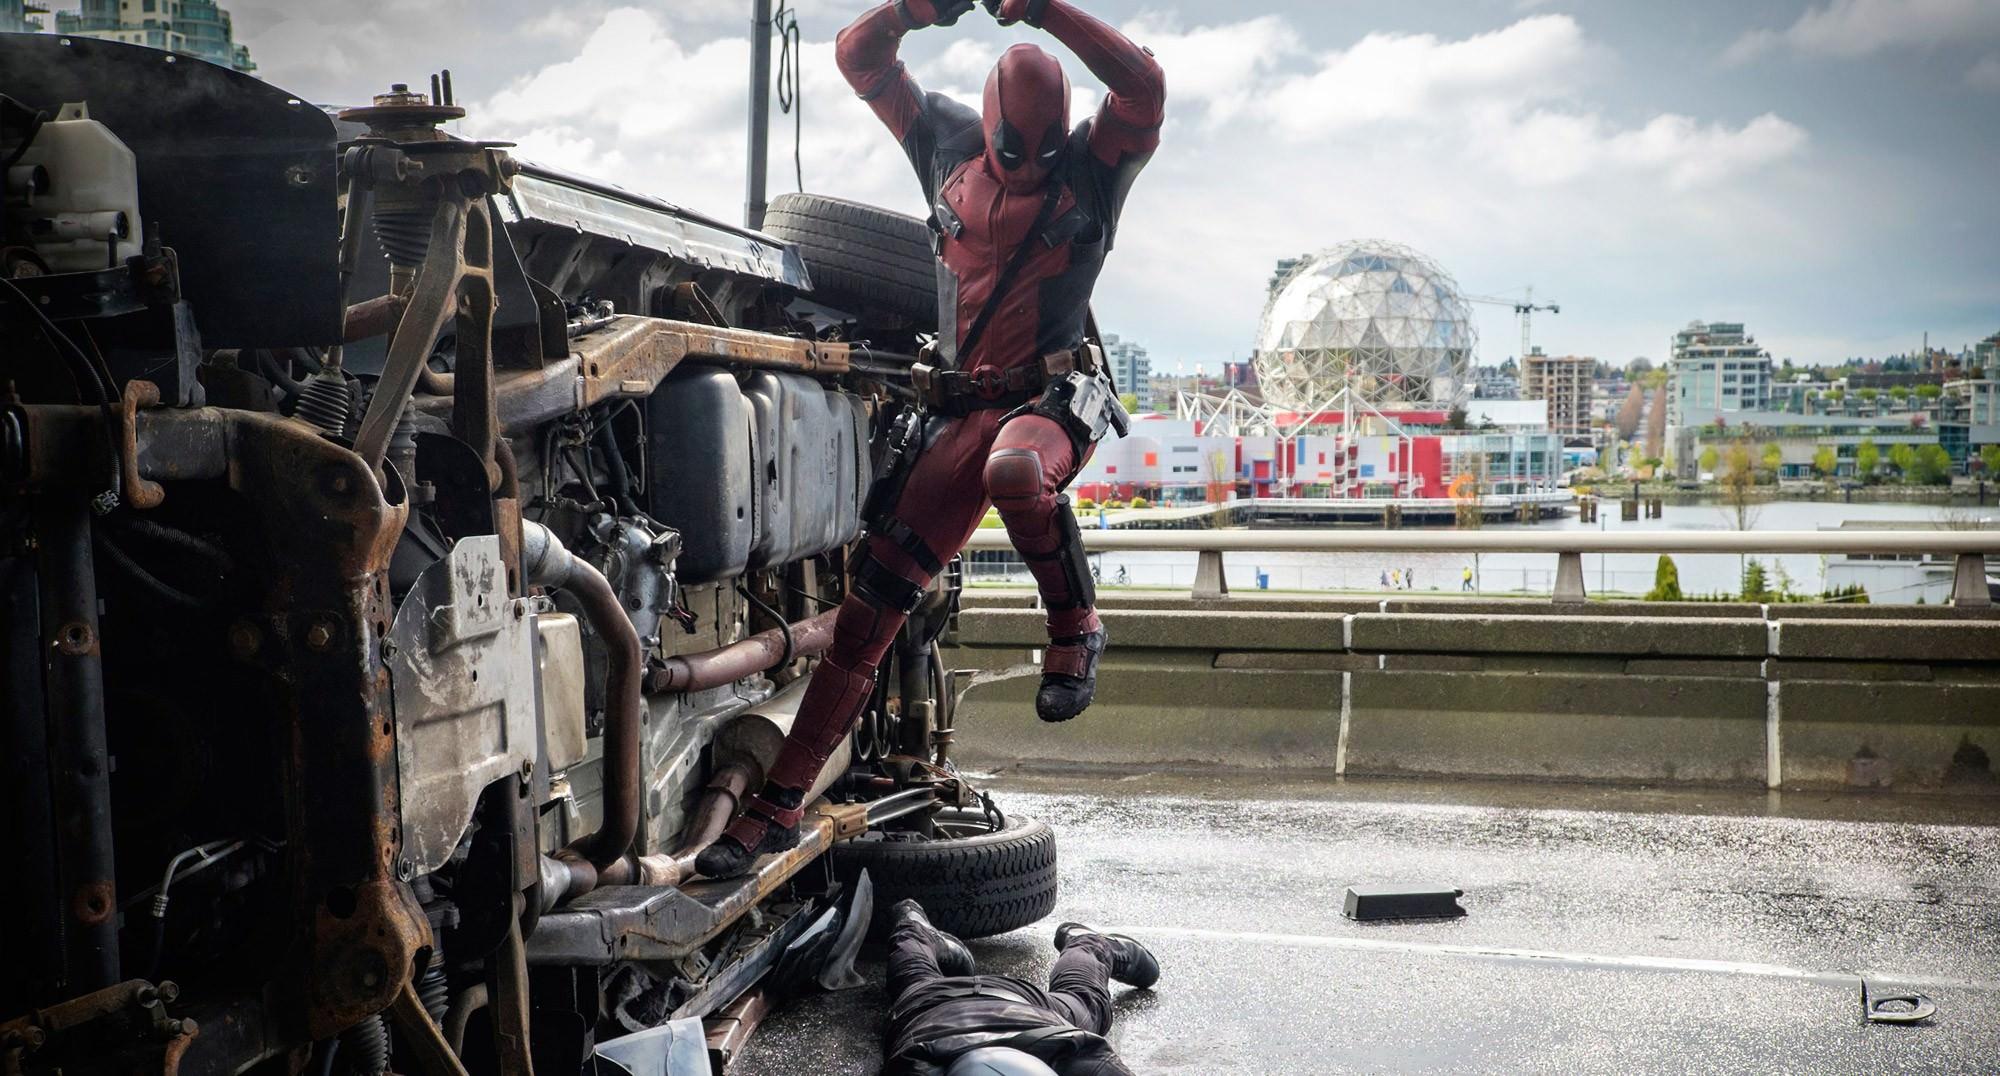 Deadpool action scene